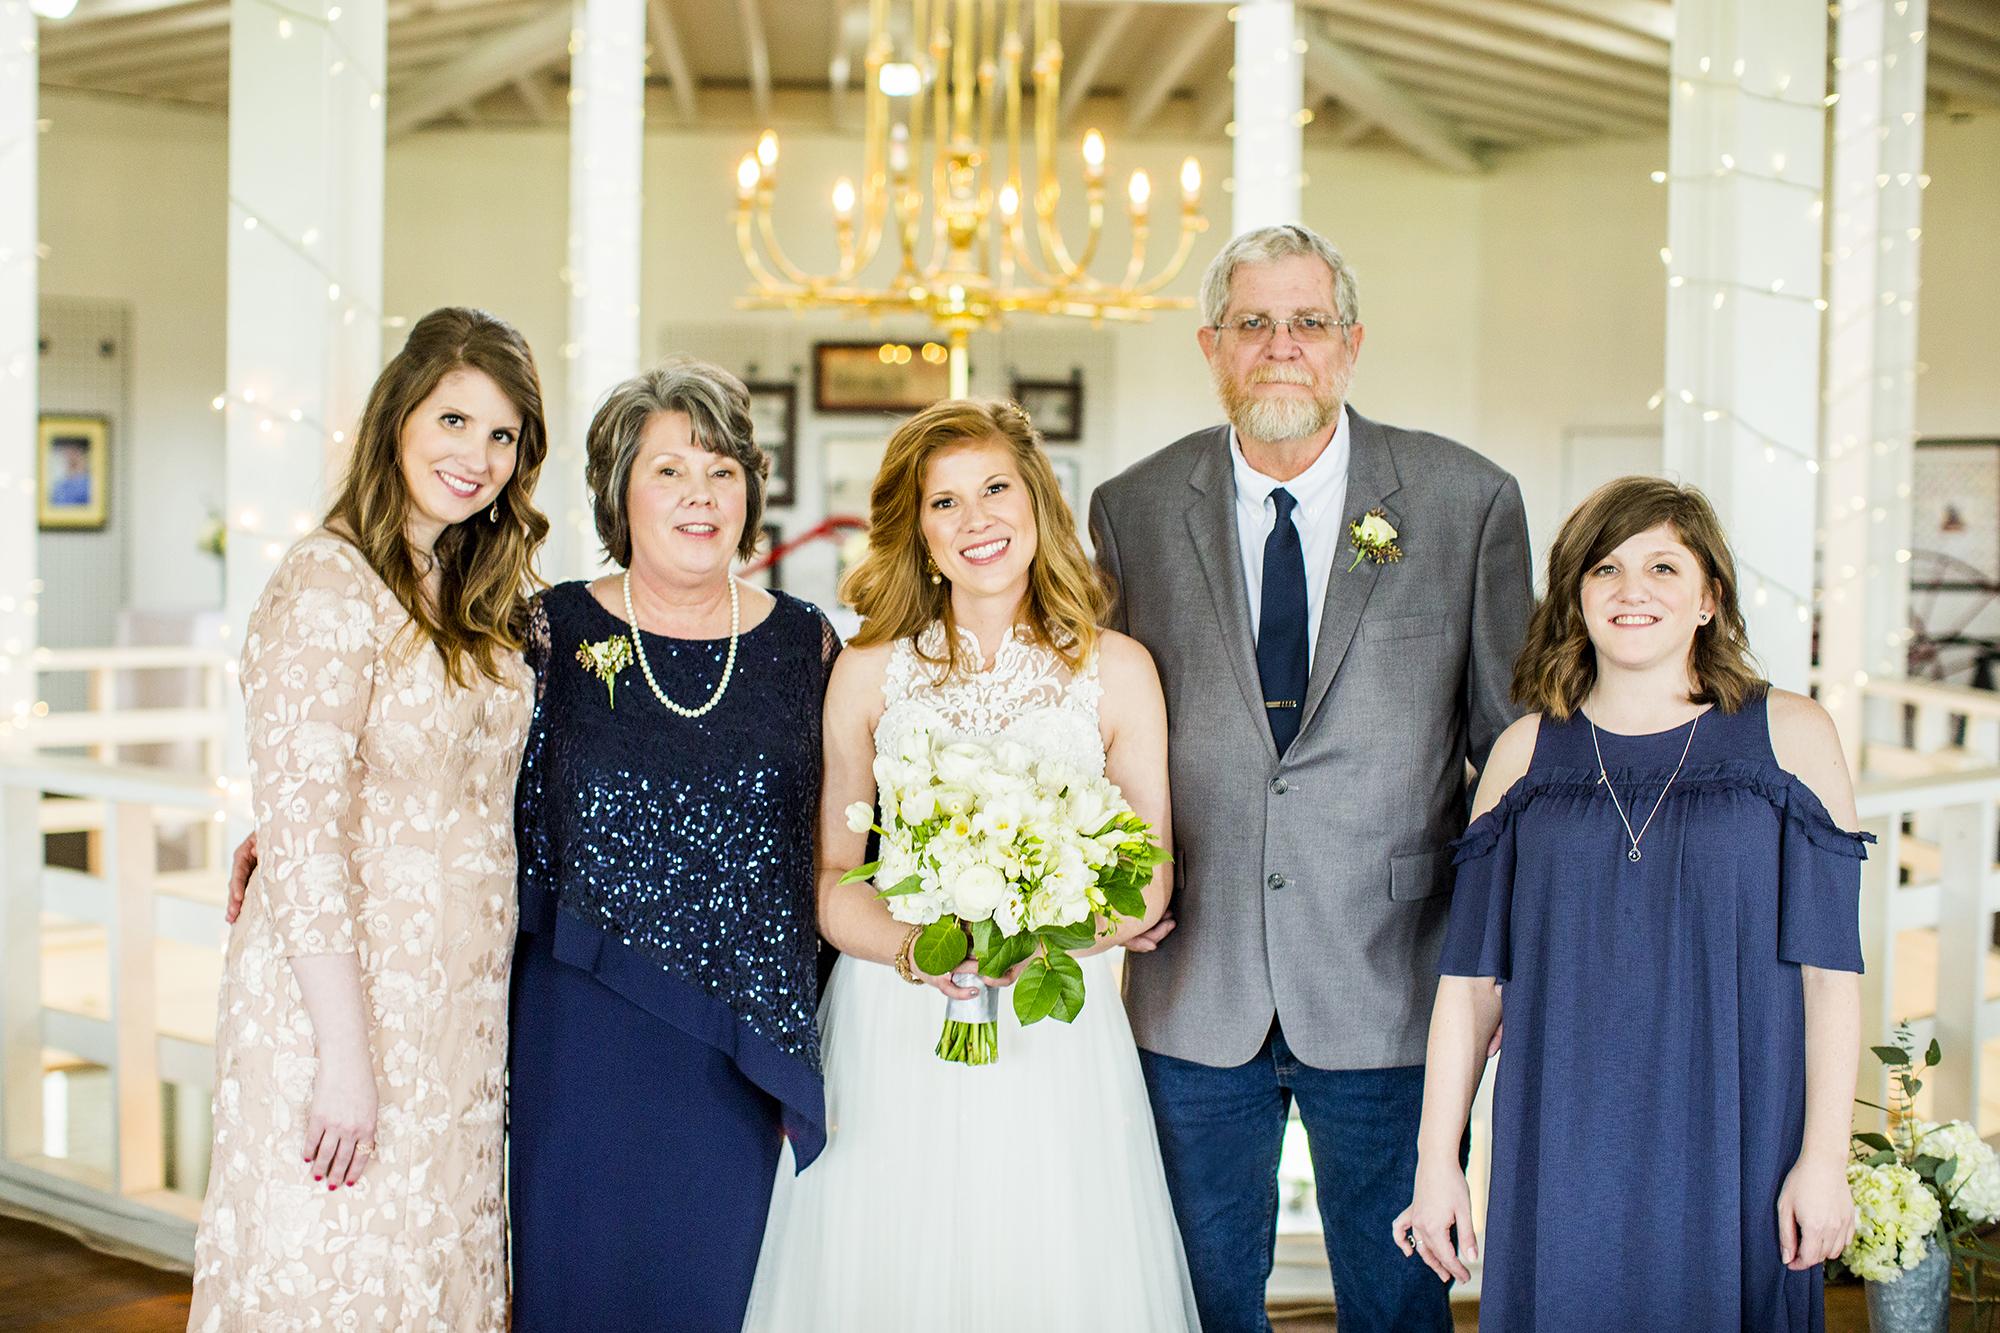 Seriously_Sabrina_Photography_Lexington_Kentucky_Red_Barn_Red_Mile_Wedding_Detoma41.jpg